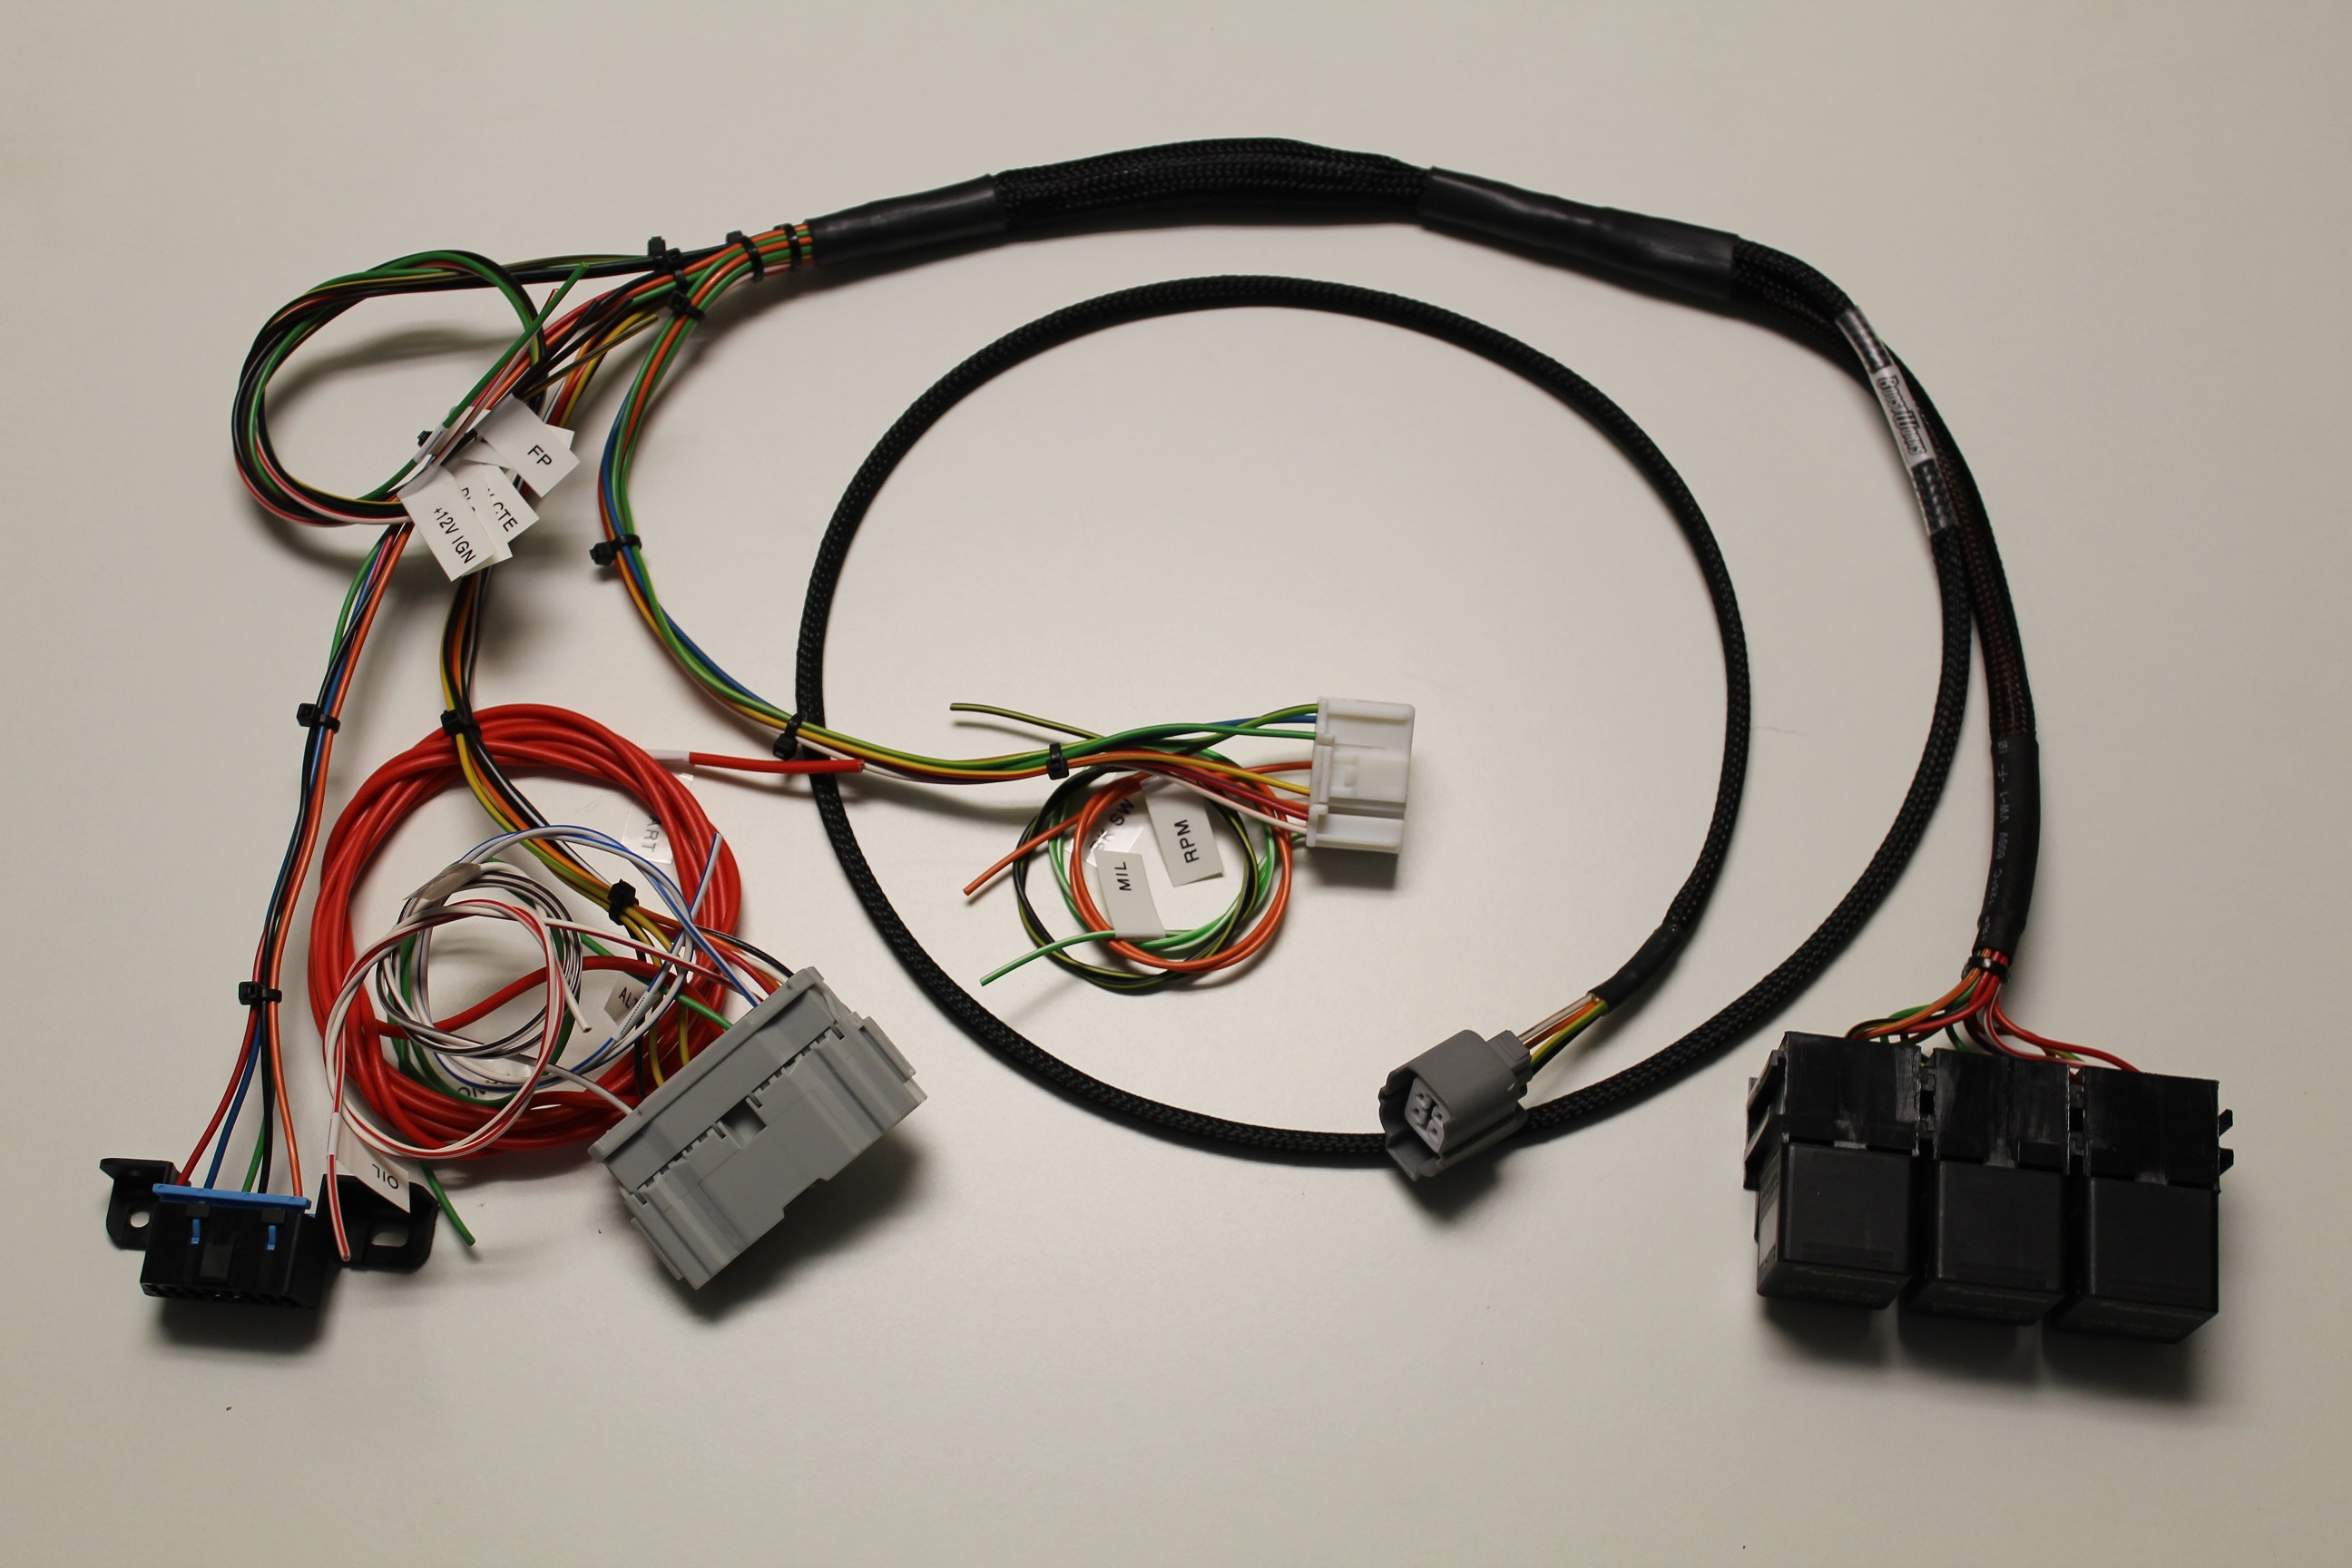 Marvelous K20A Wiring Harness Basic Electronics Wiring Diagram Wiring Cloud Biosomenaidewilluminateatxorg